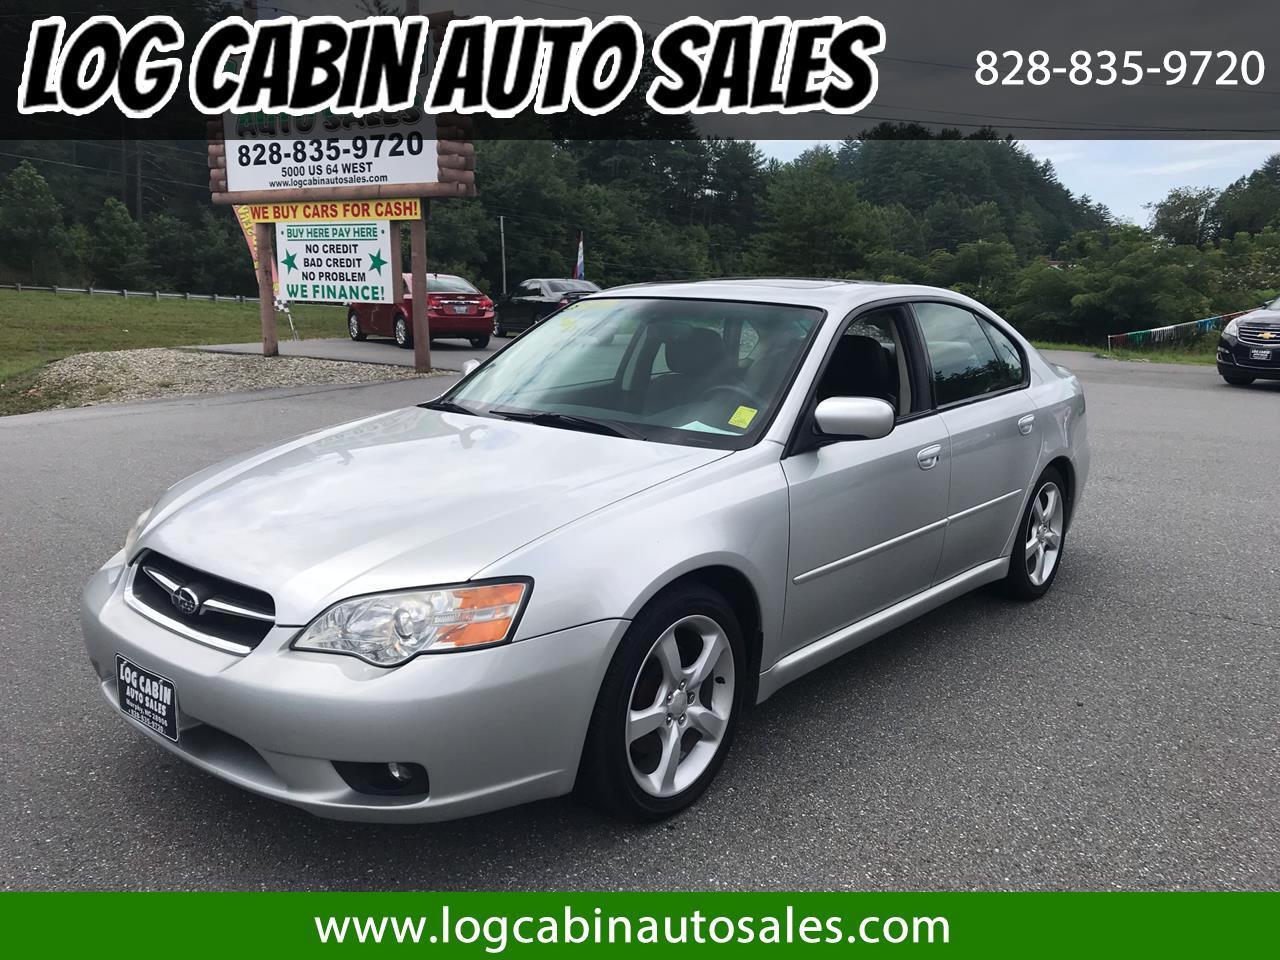 Subaru Legacy 2.5 i Limited 2007